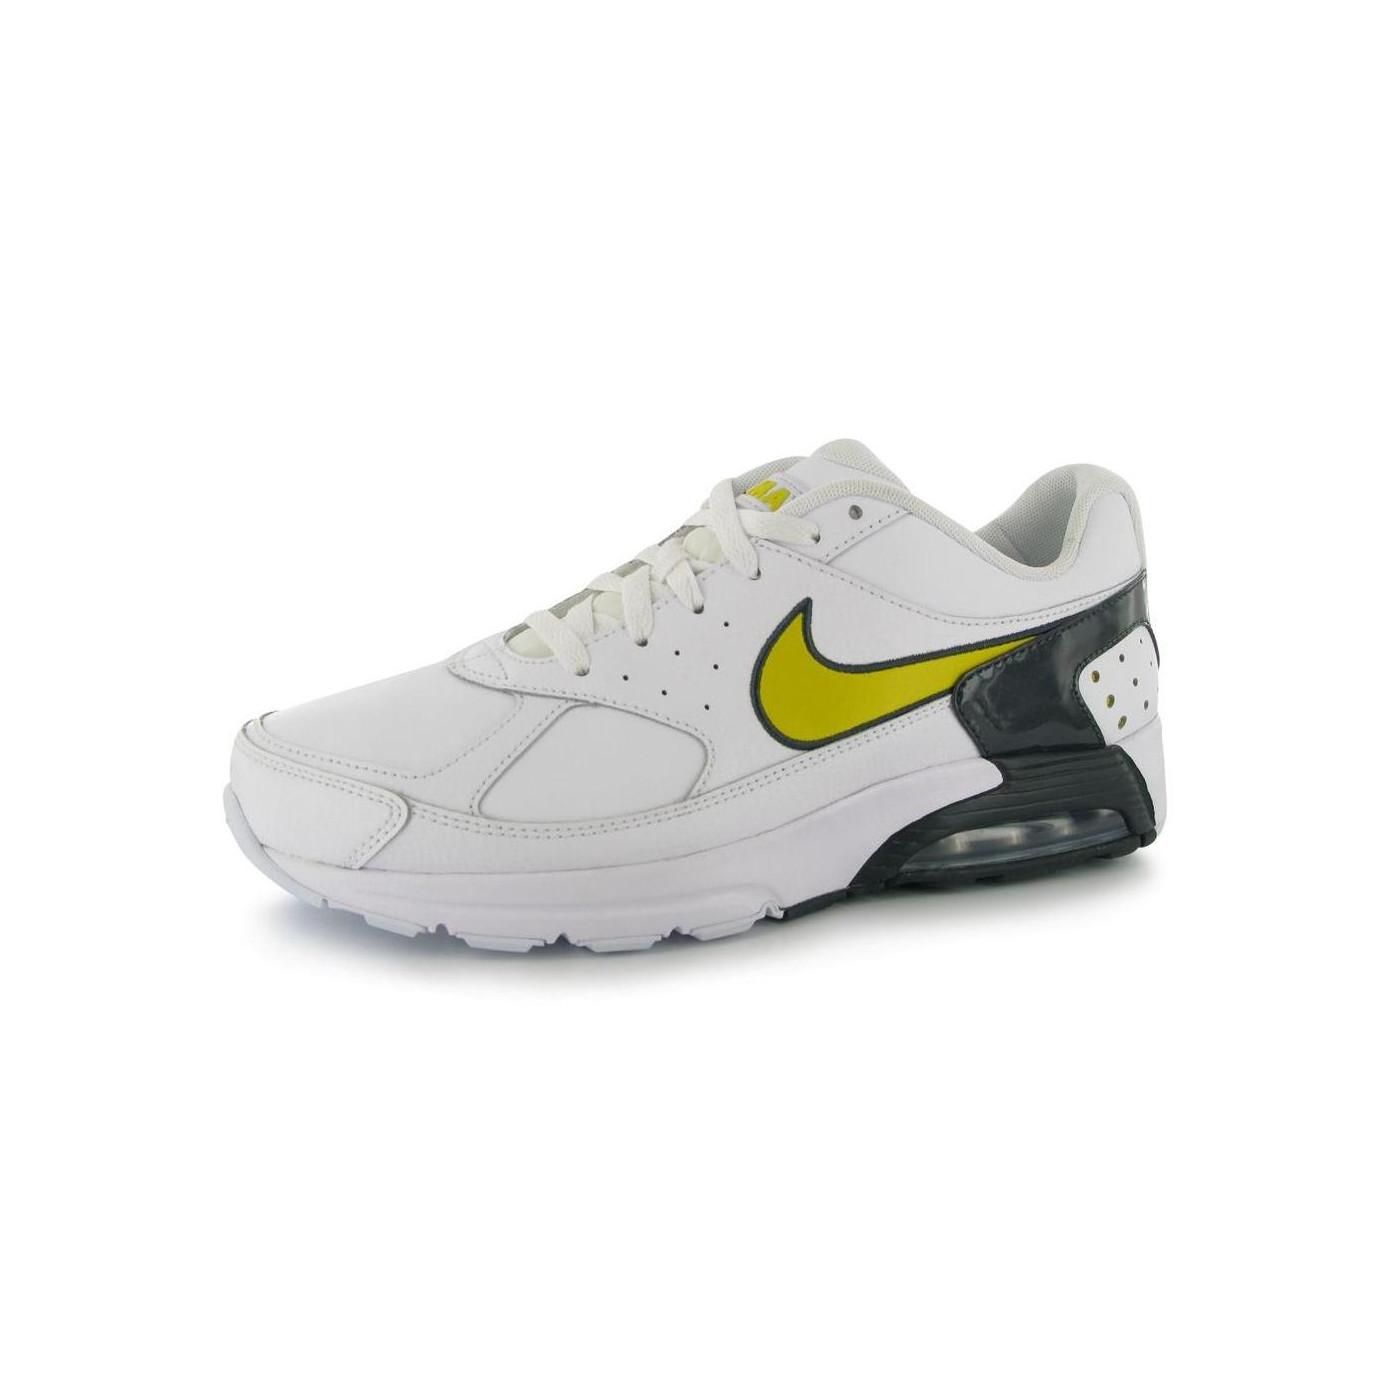 official photos 57ba0 f29e3 Nike Air Max Faze Leather Mens Running Shoes